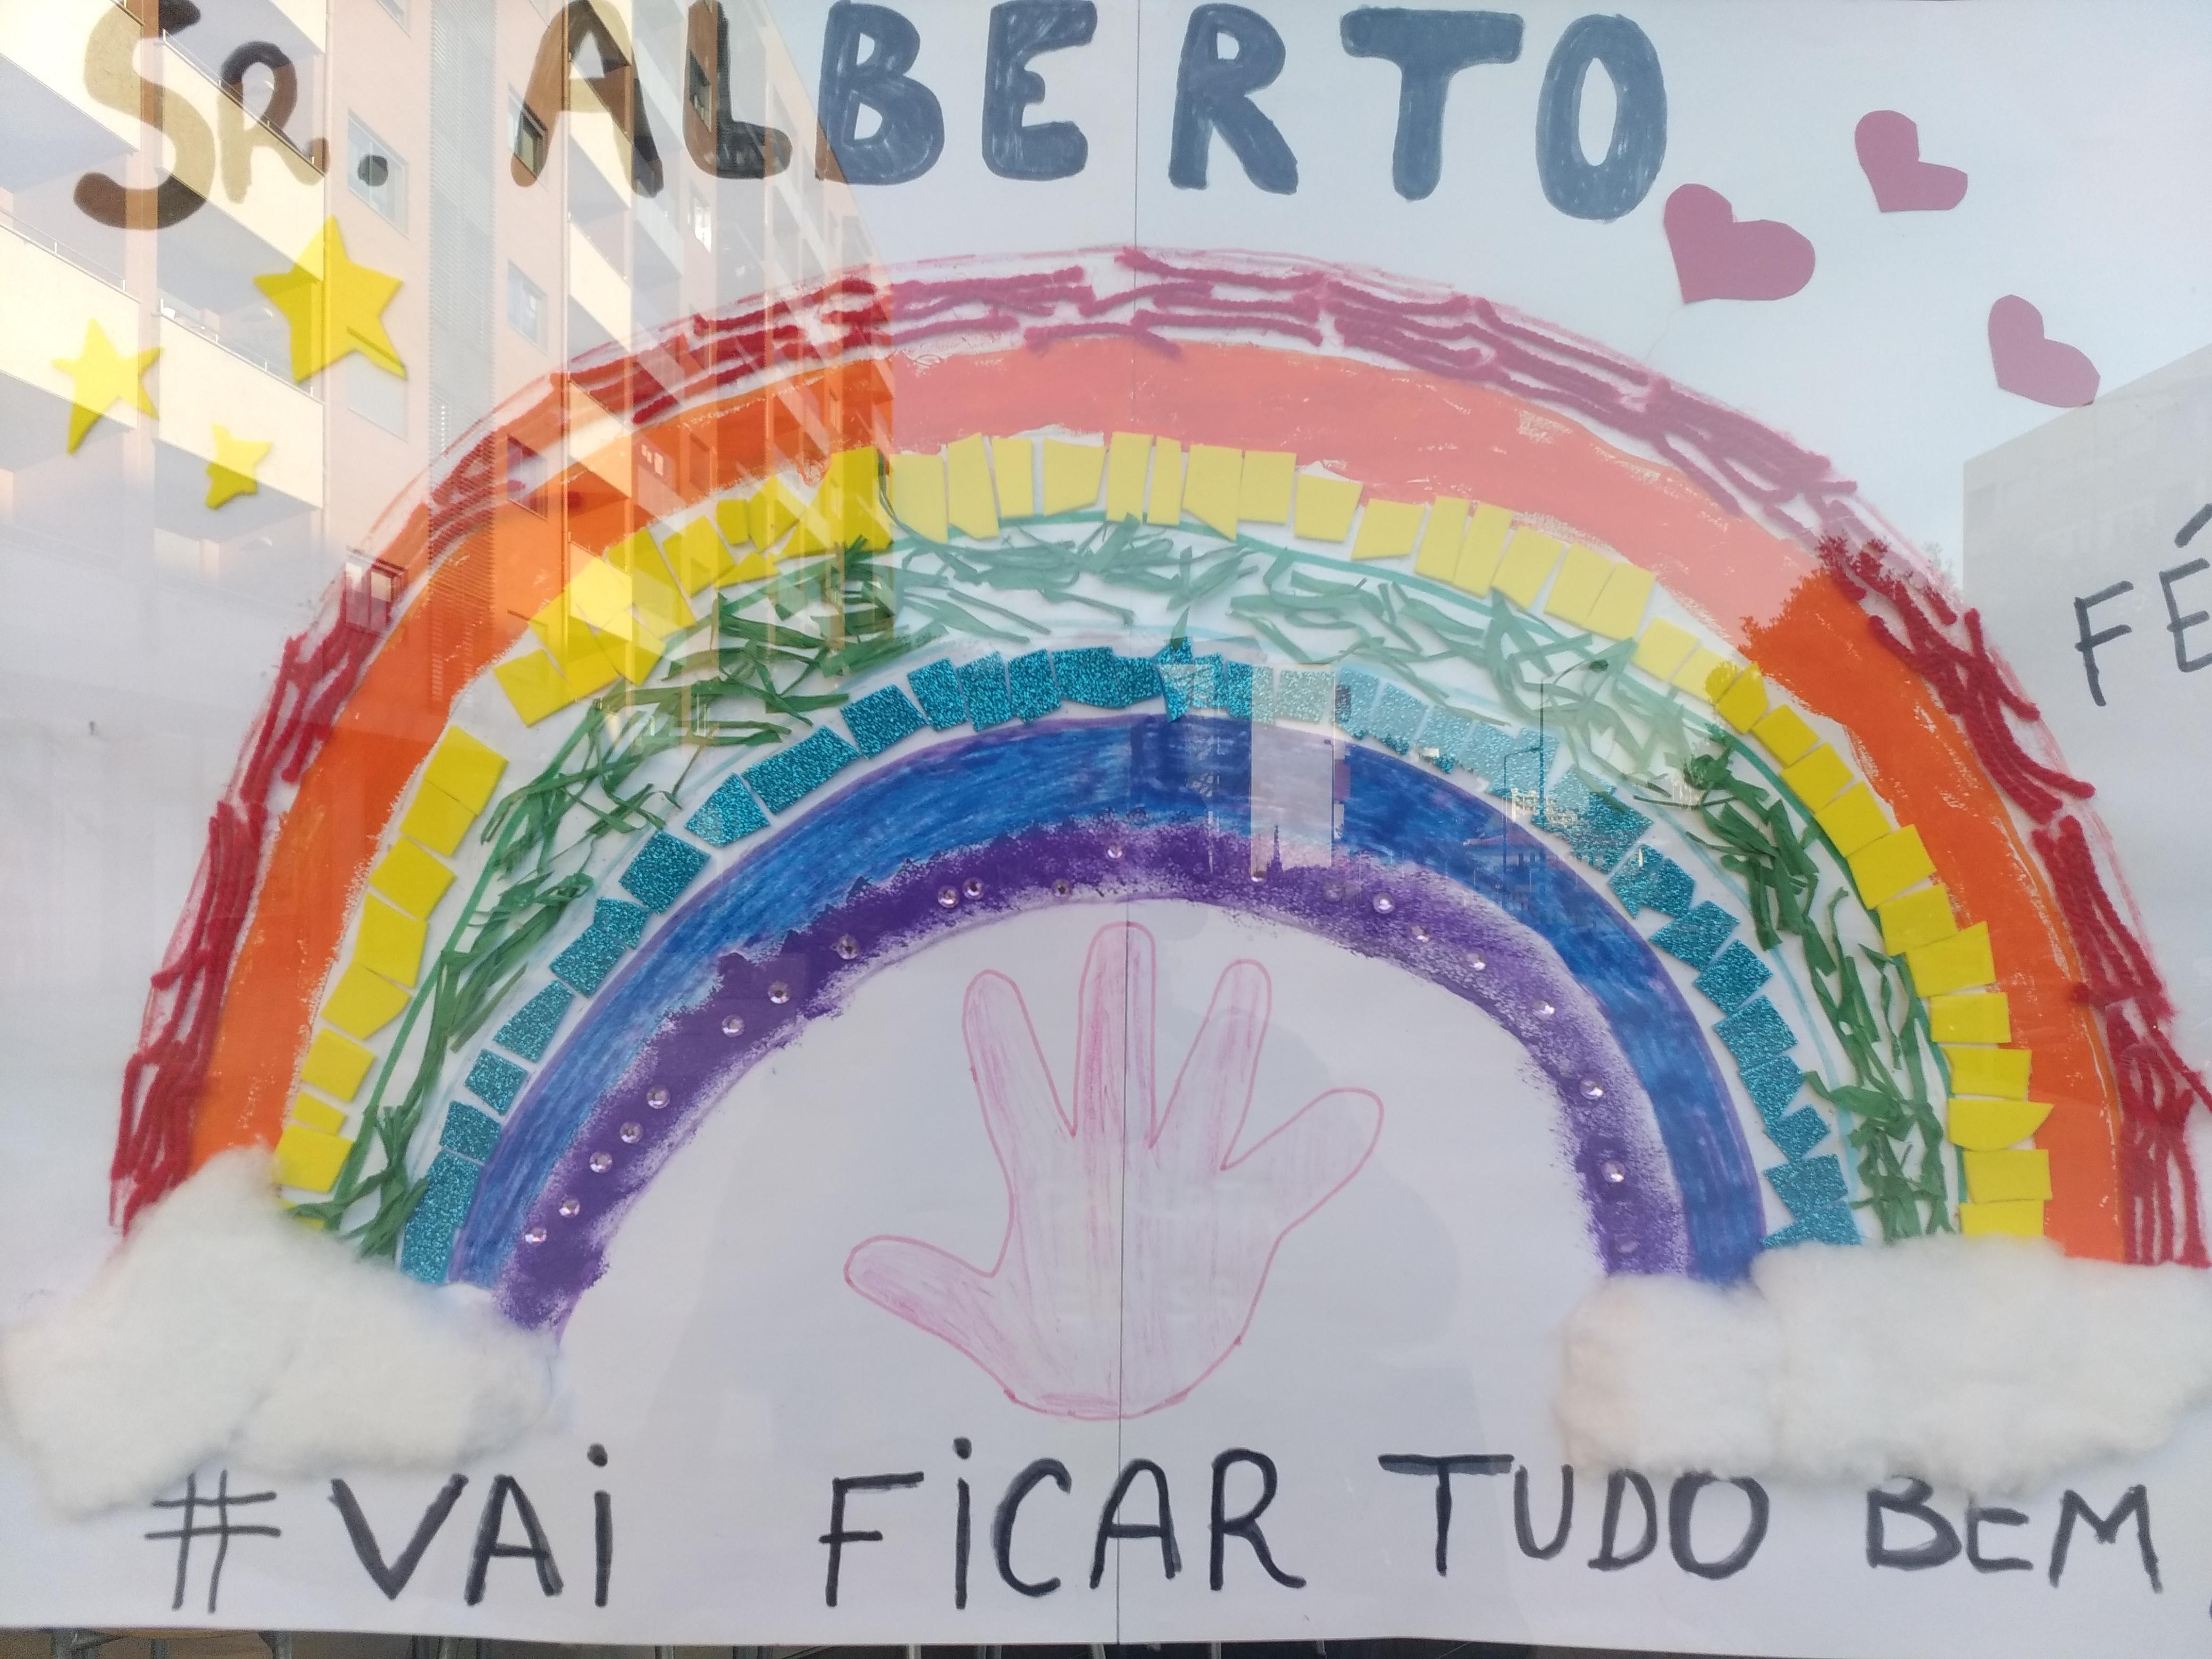 <h4></h4><p>Fé, Senhor Alberto #vaificartudobem</p>